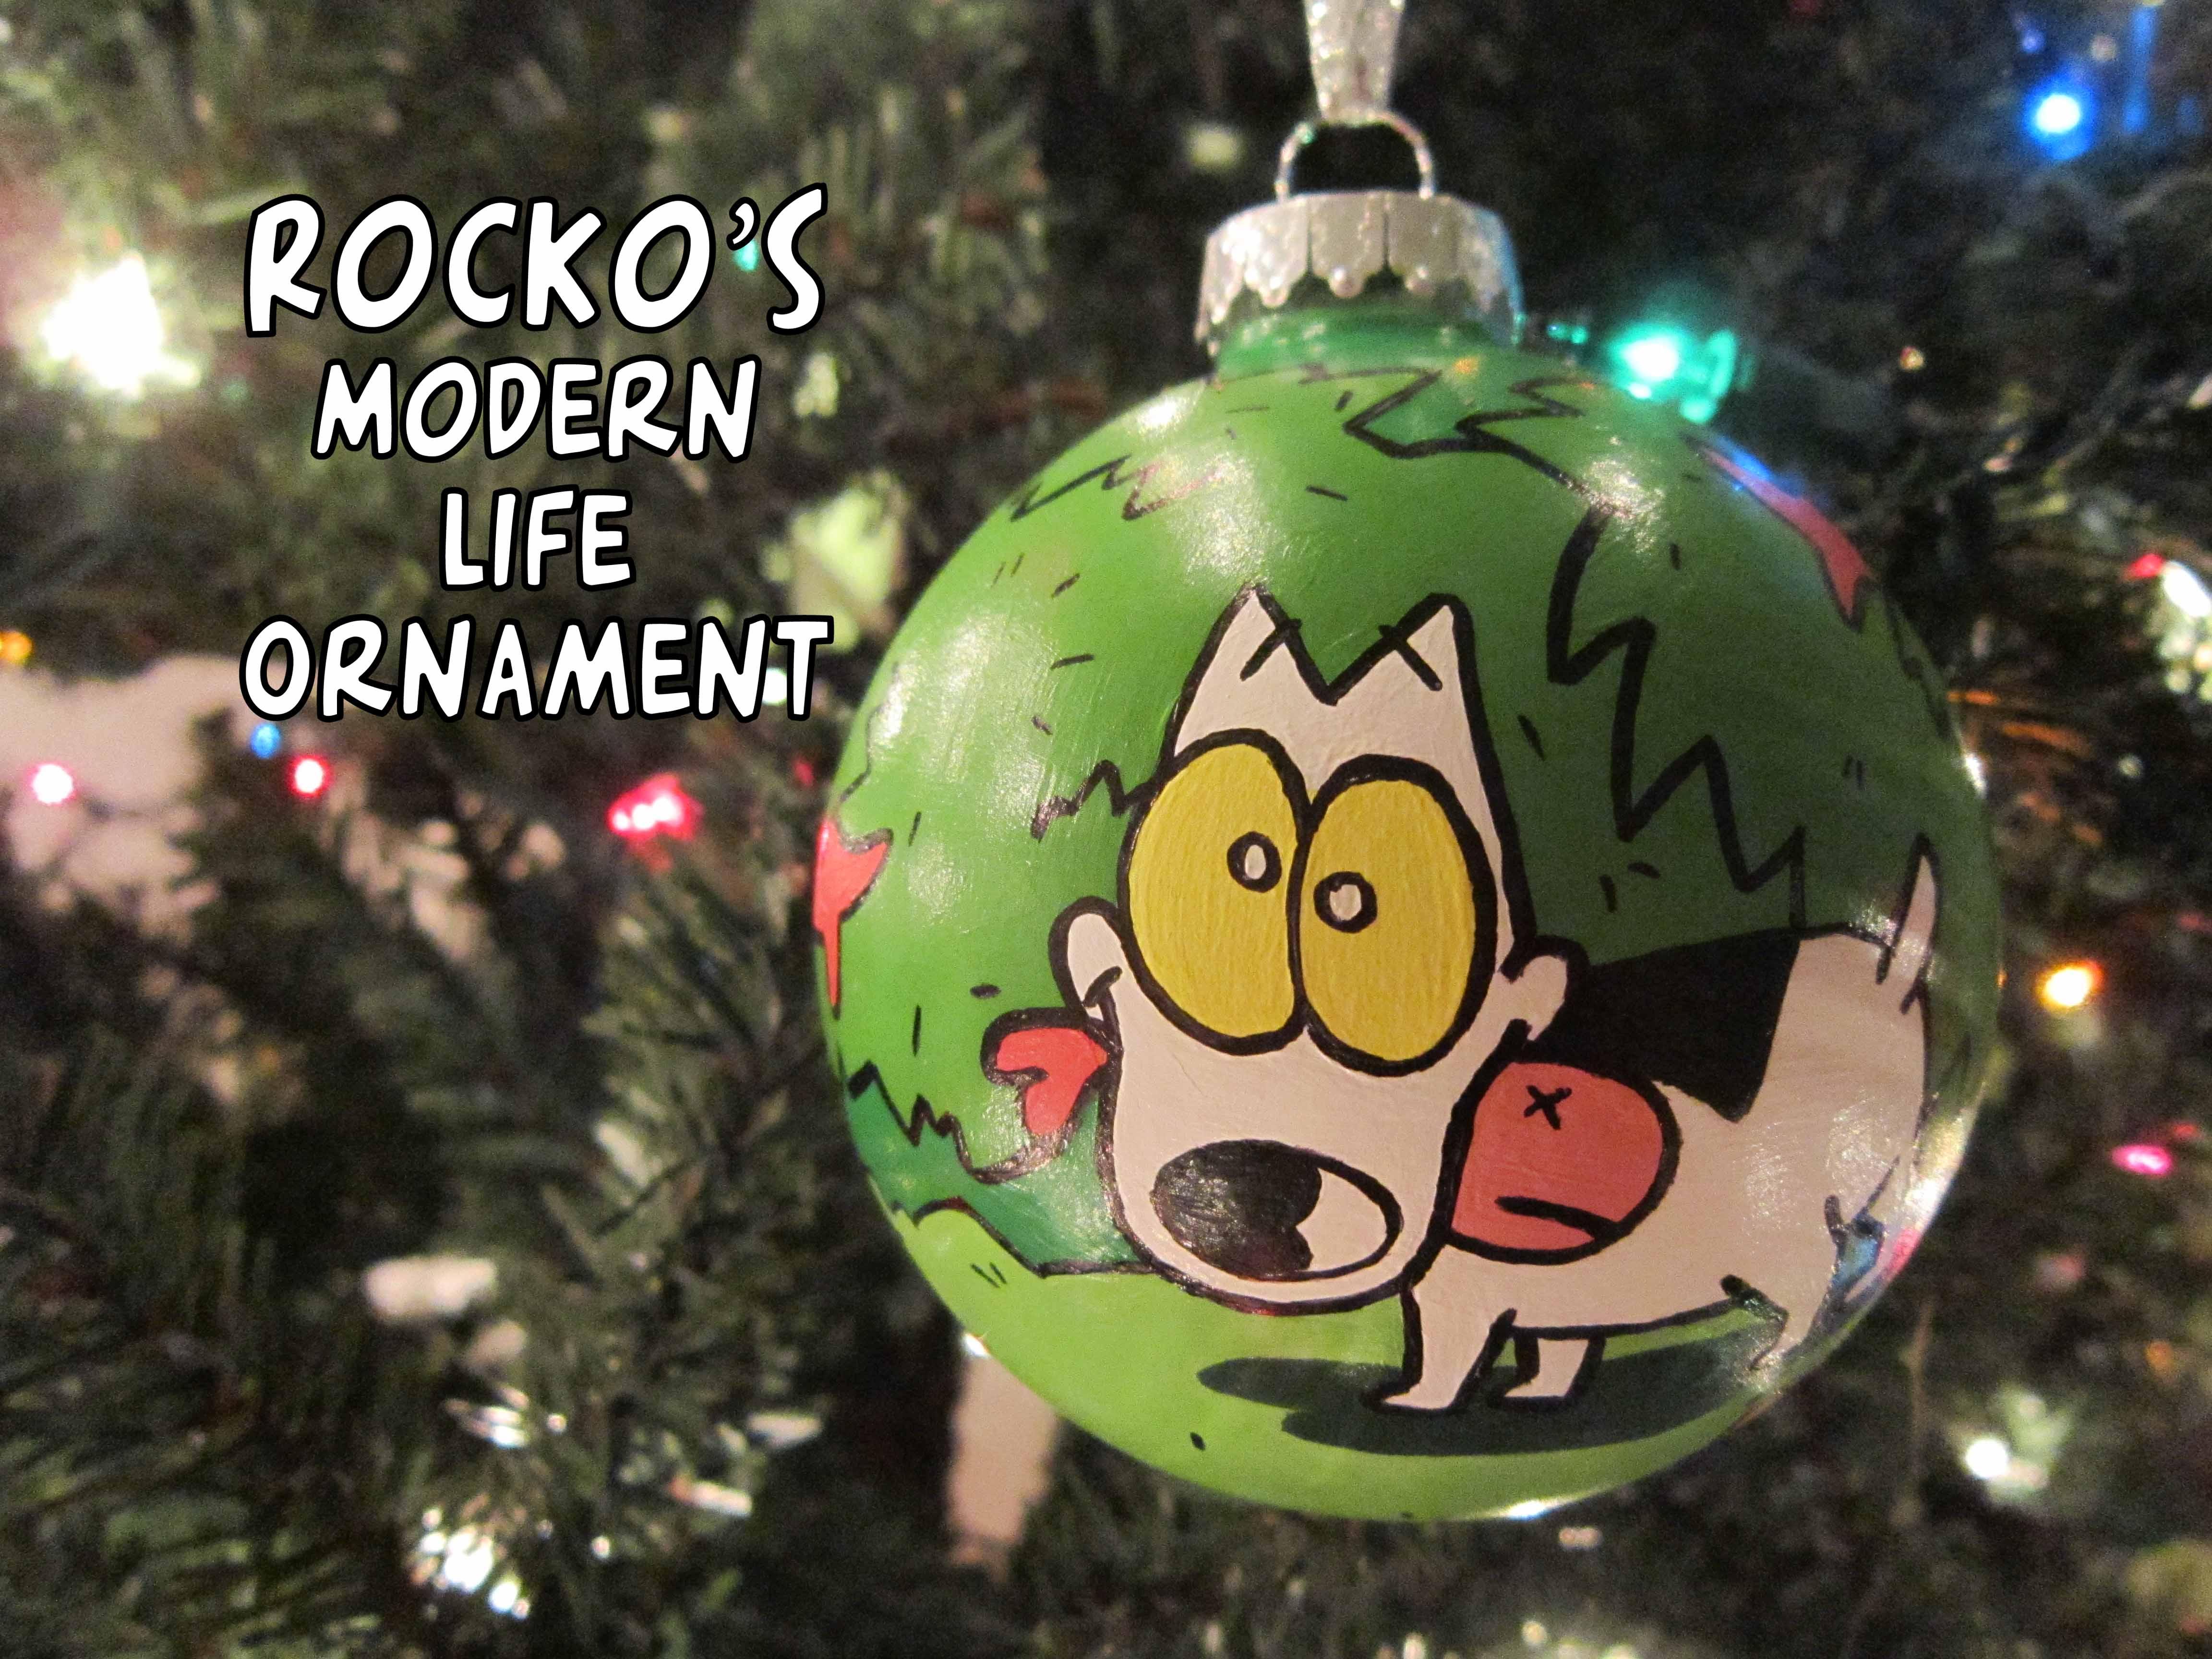 ROCKO'S MODERN LIFE ORNAMENT (SPUNKY)